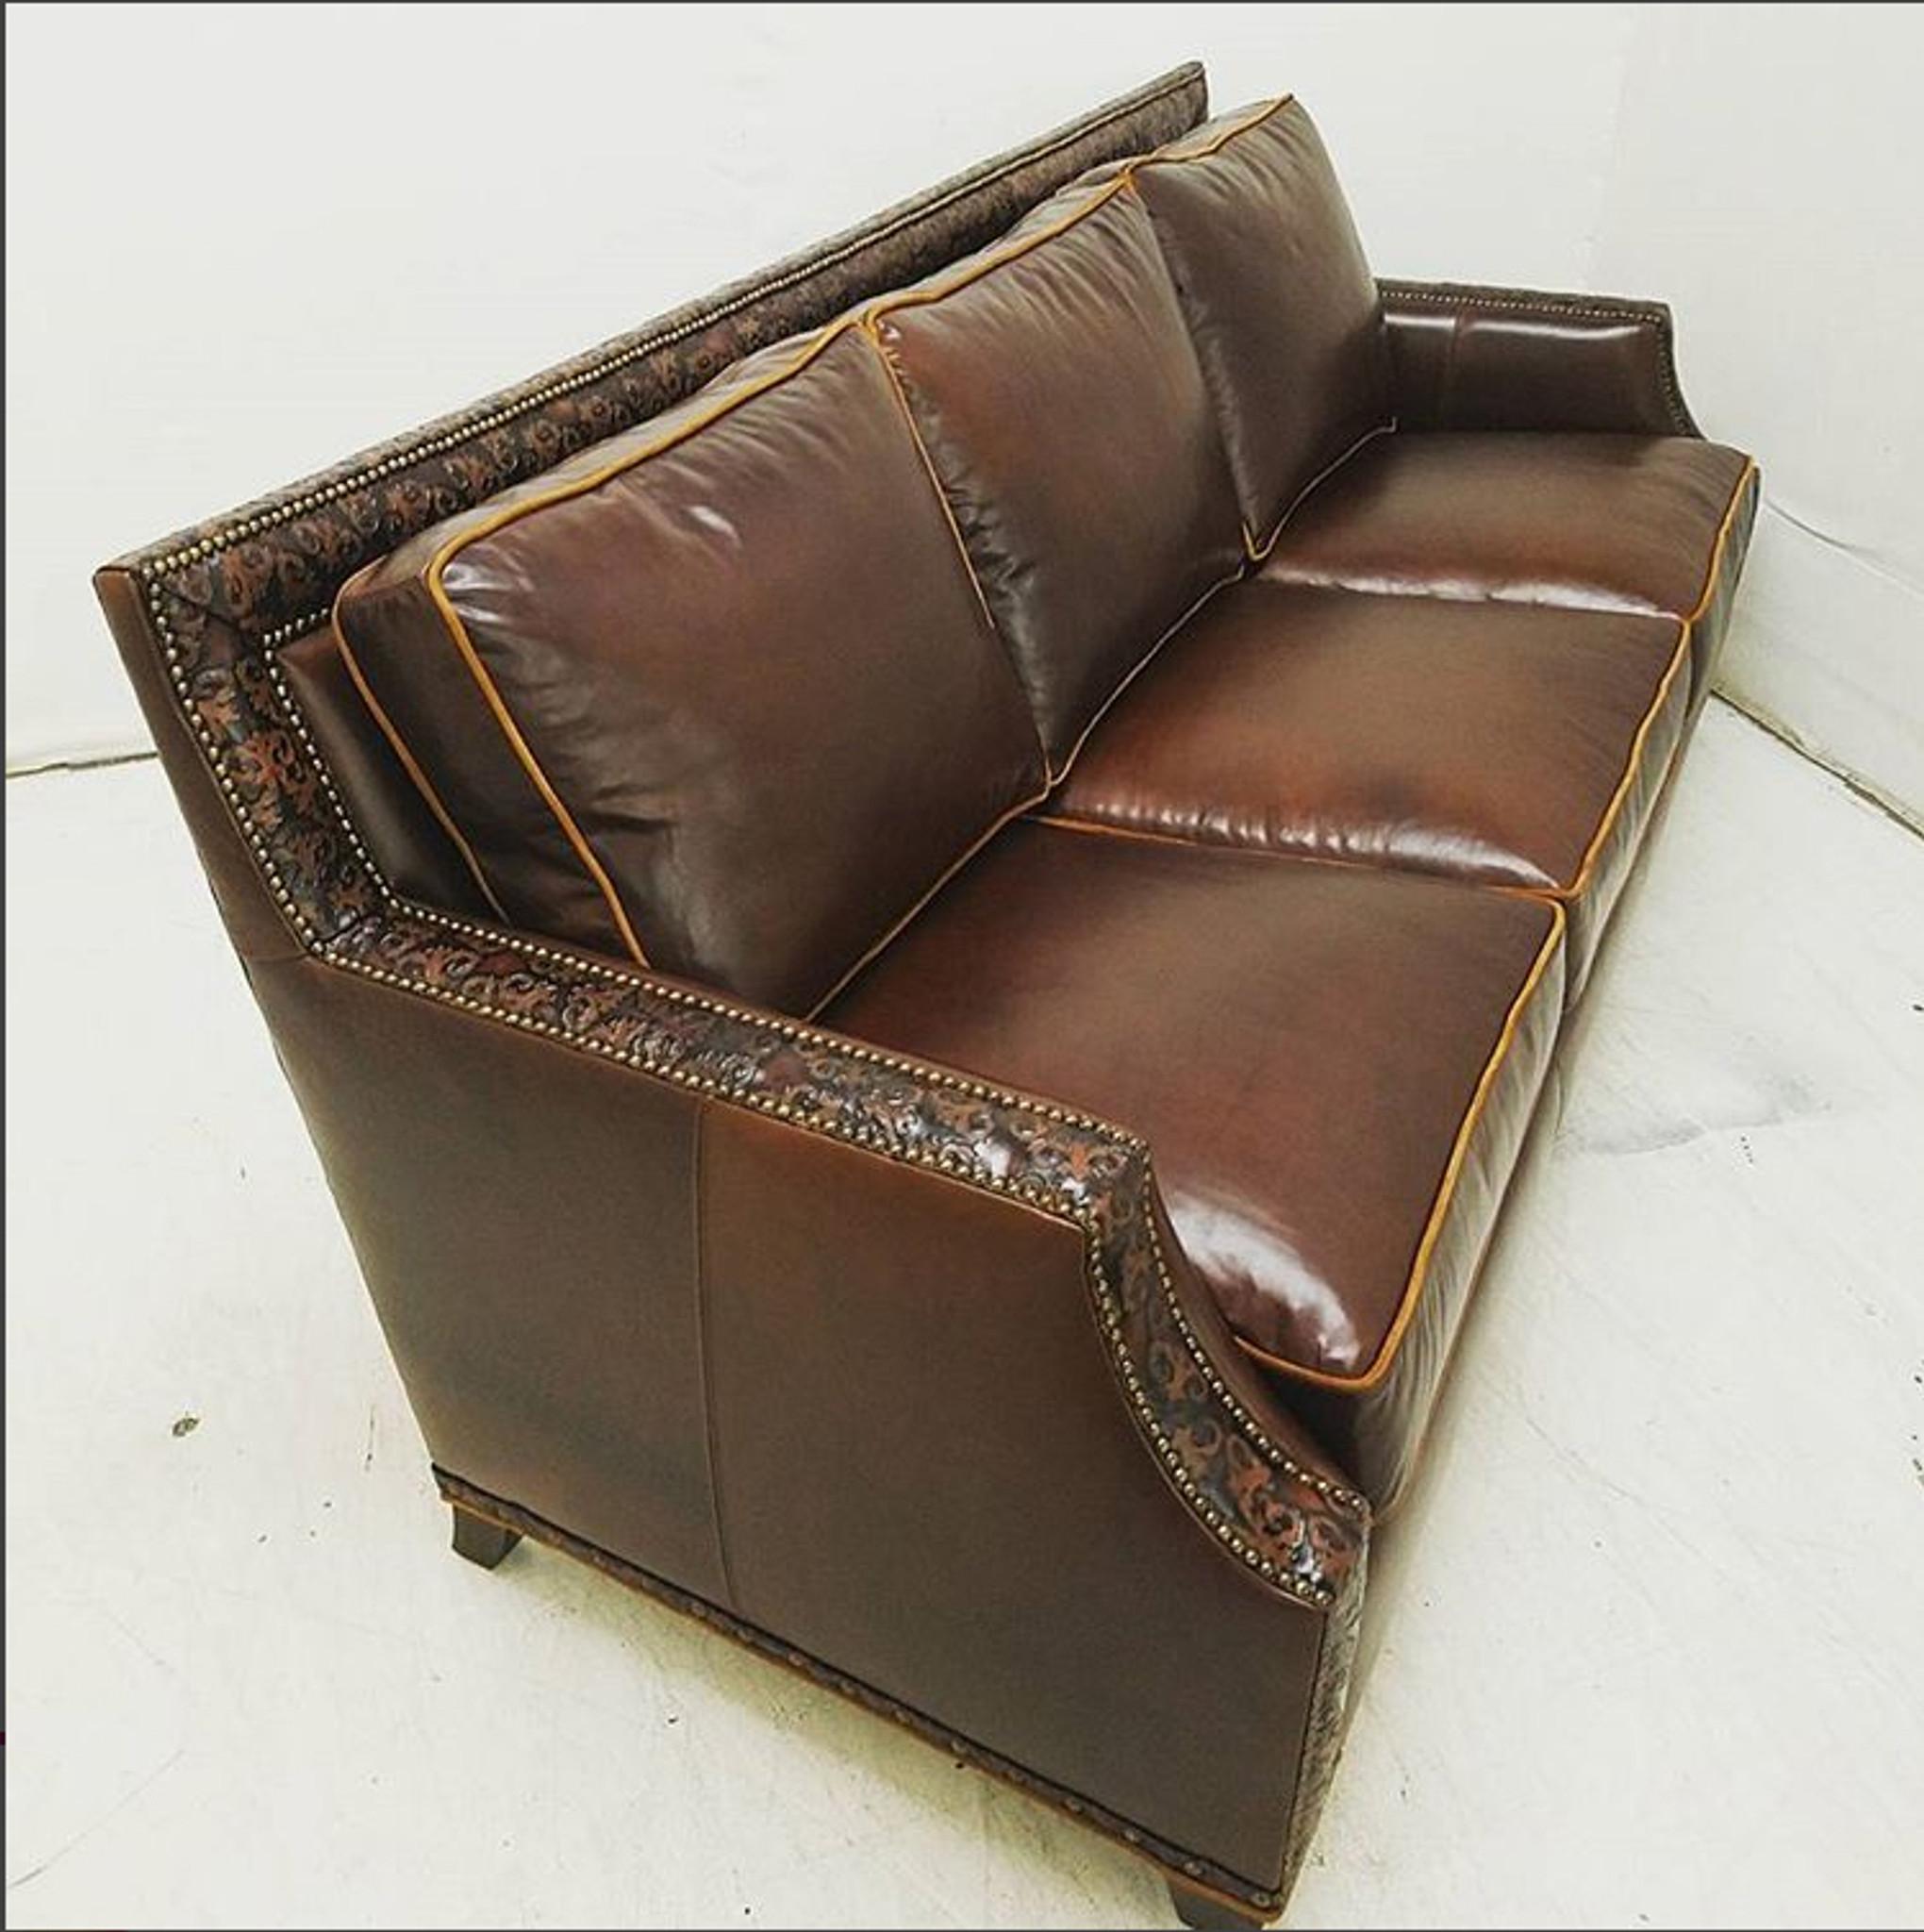 72 lancaster leather sofa la sofateria maddox american heritage custom made in usa 20 off